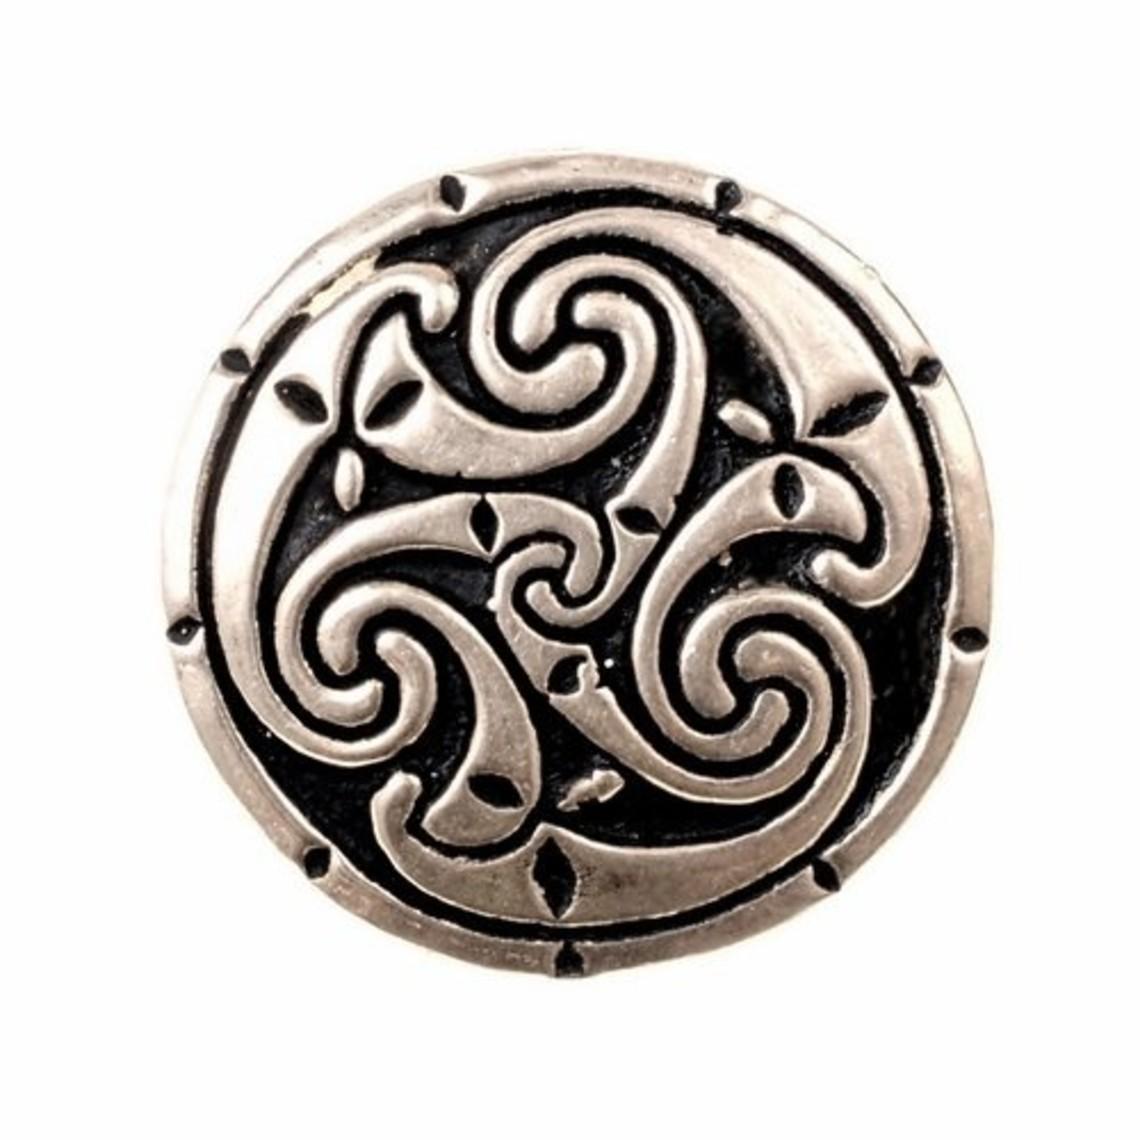 Celtic Ring mit triskelion, versilbert